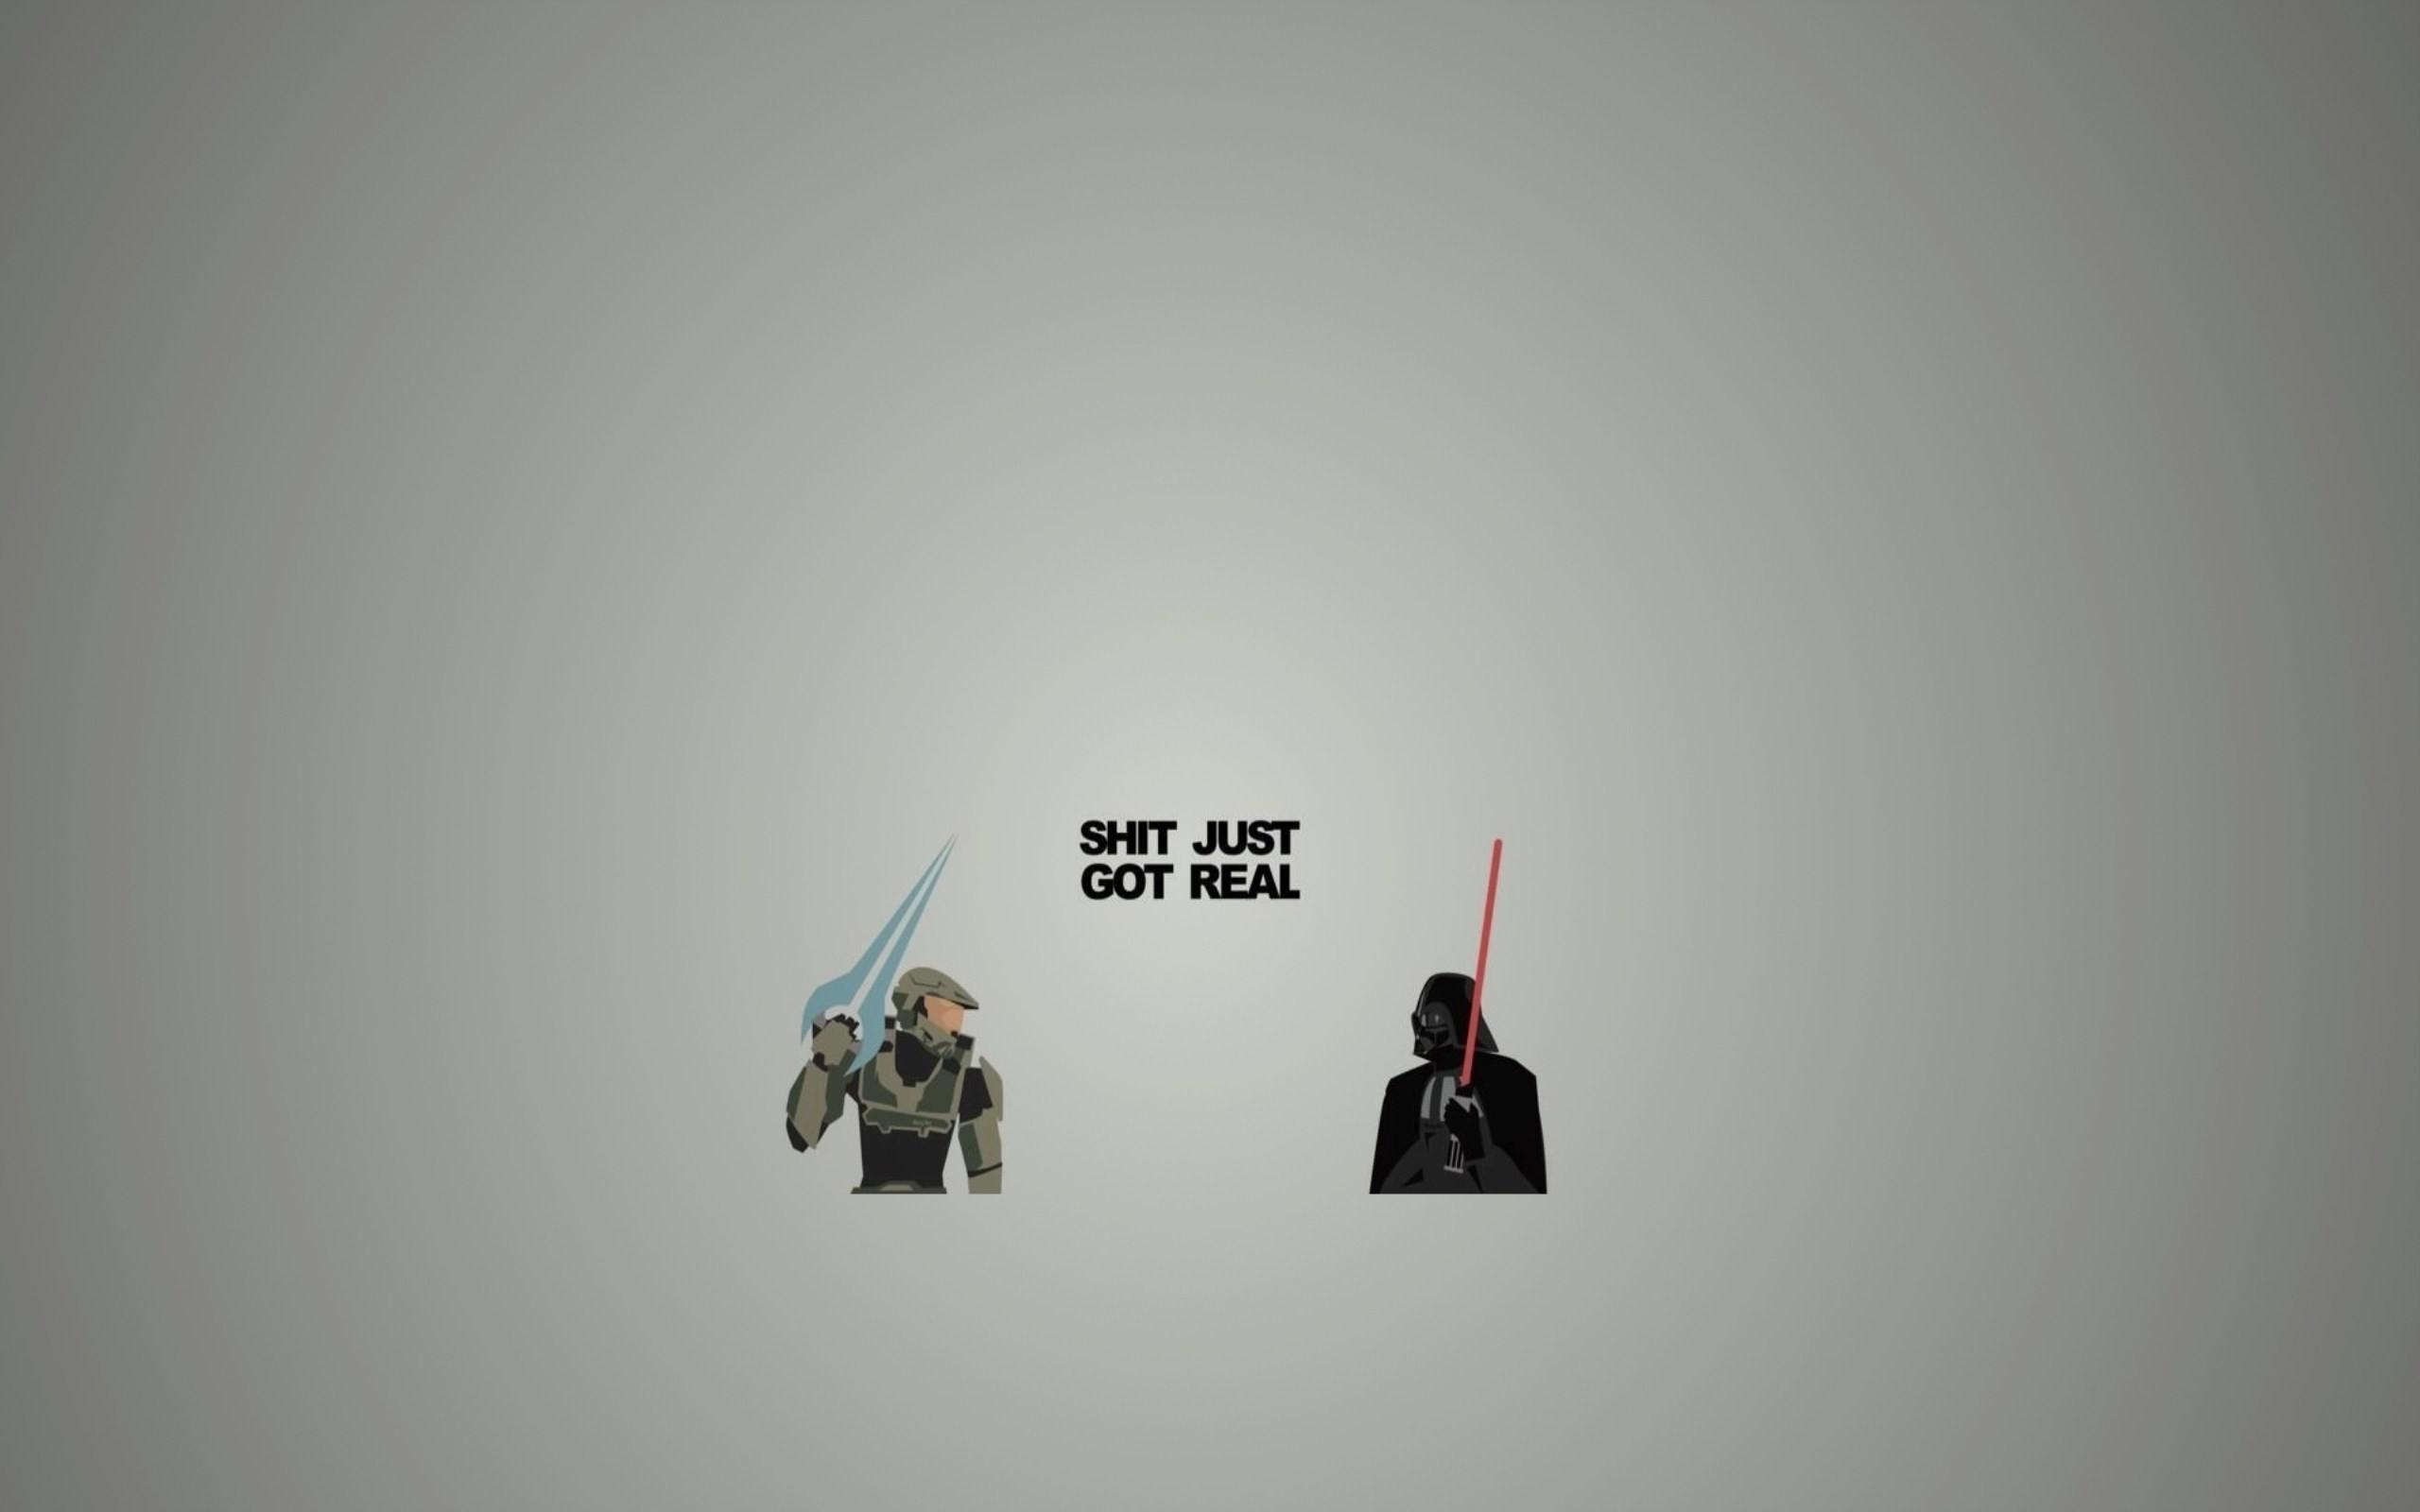 Halo, Star Wars, Master Chief, Darth Vader, Artwork, Humor Wallpapers HD /  Desktop and Mobile Backgrounds